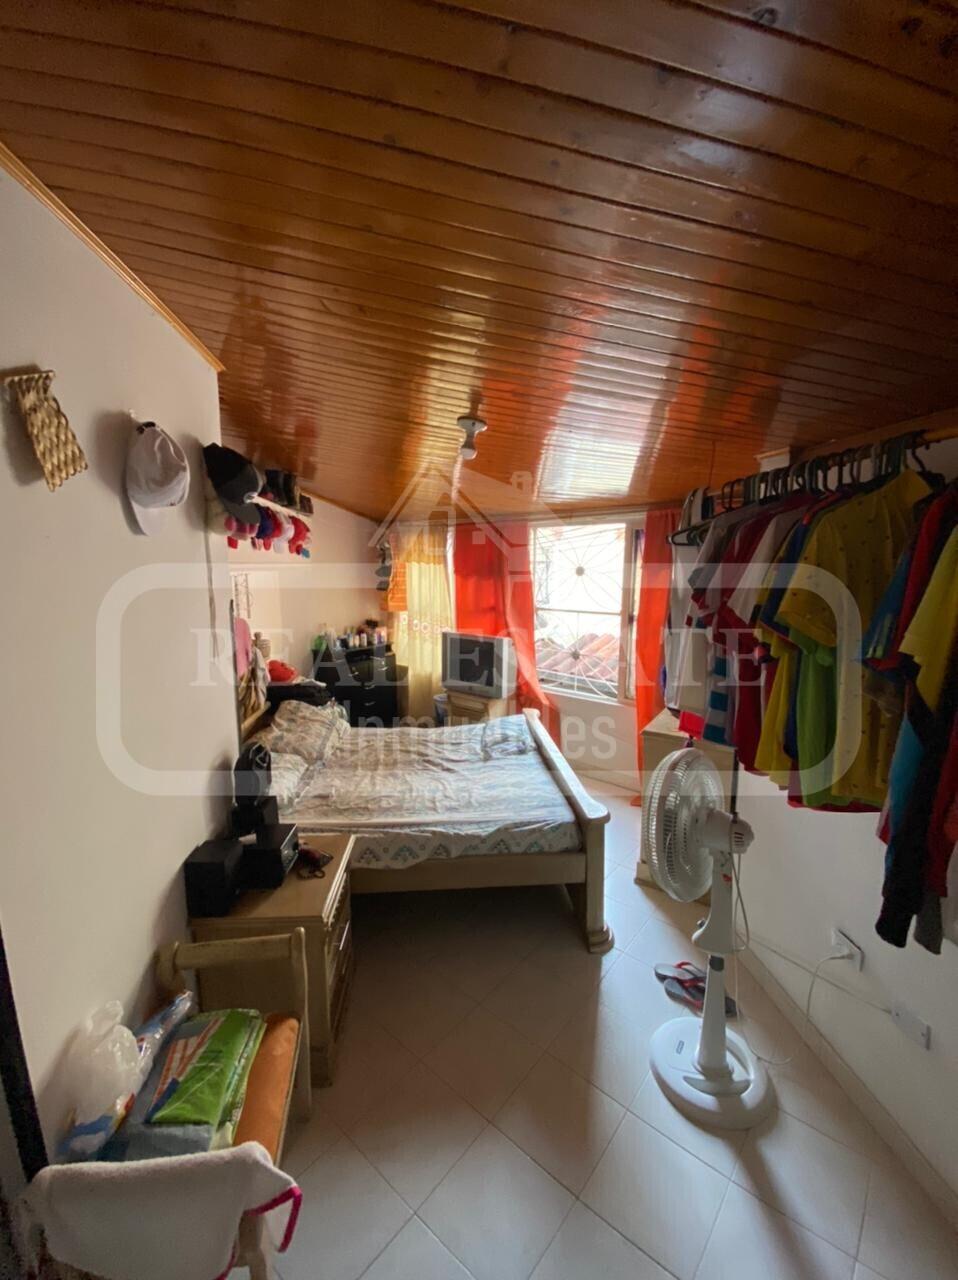 COD 210599 | CASA SAN BERNARDO